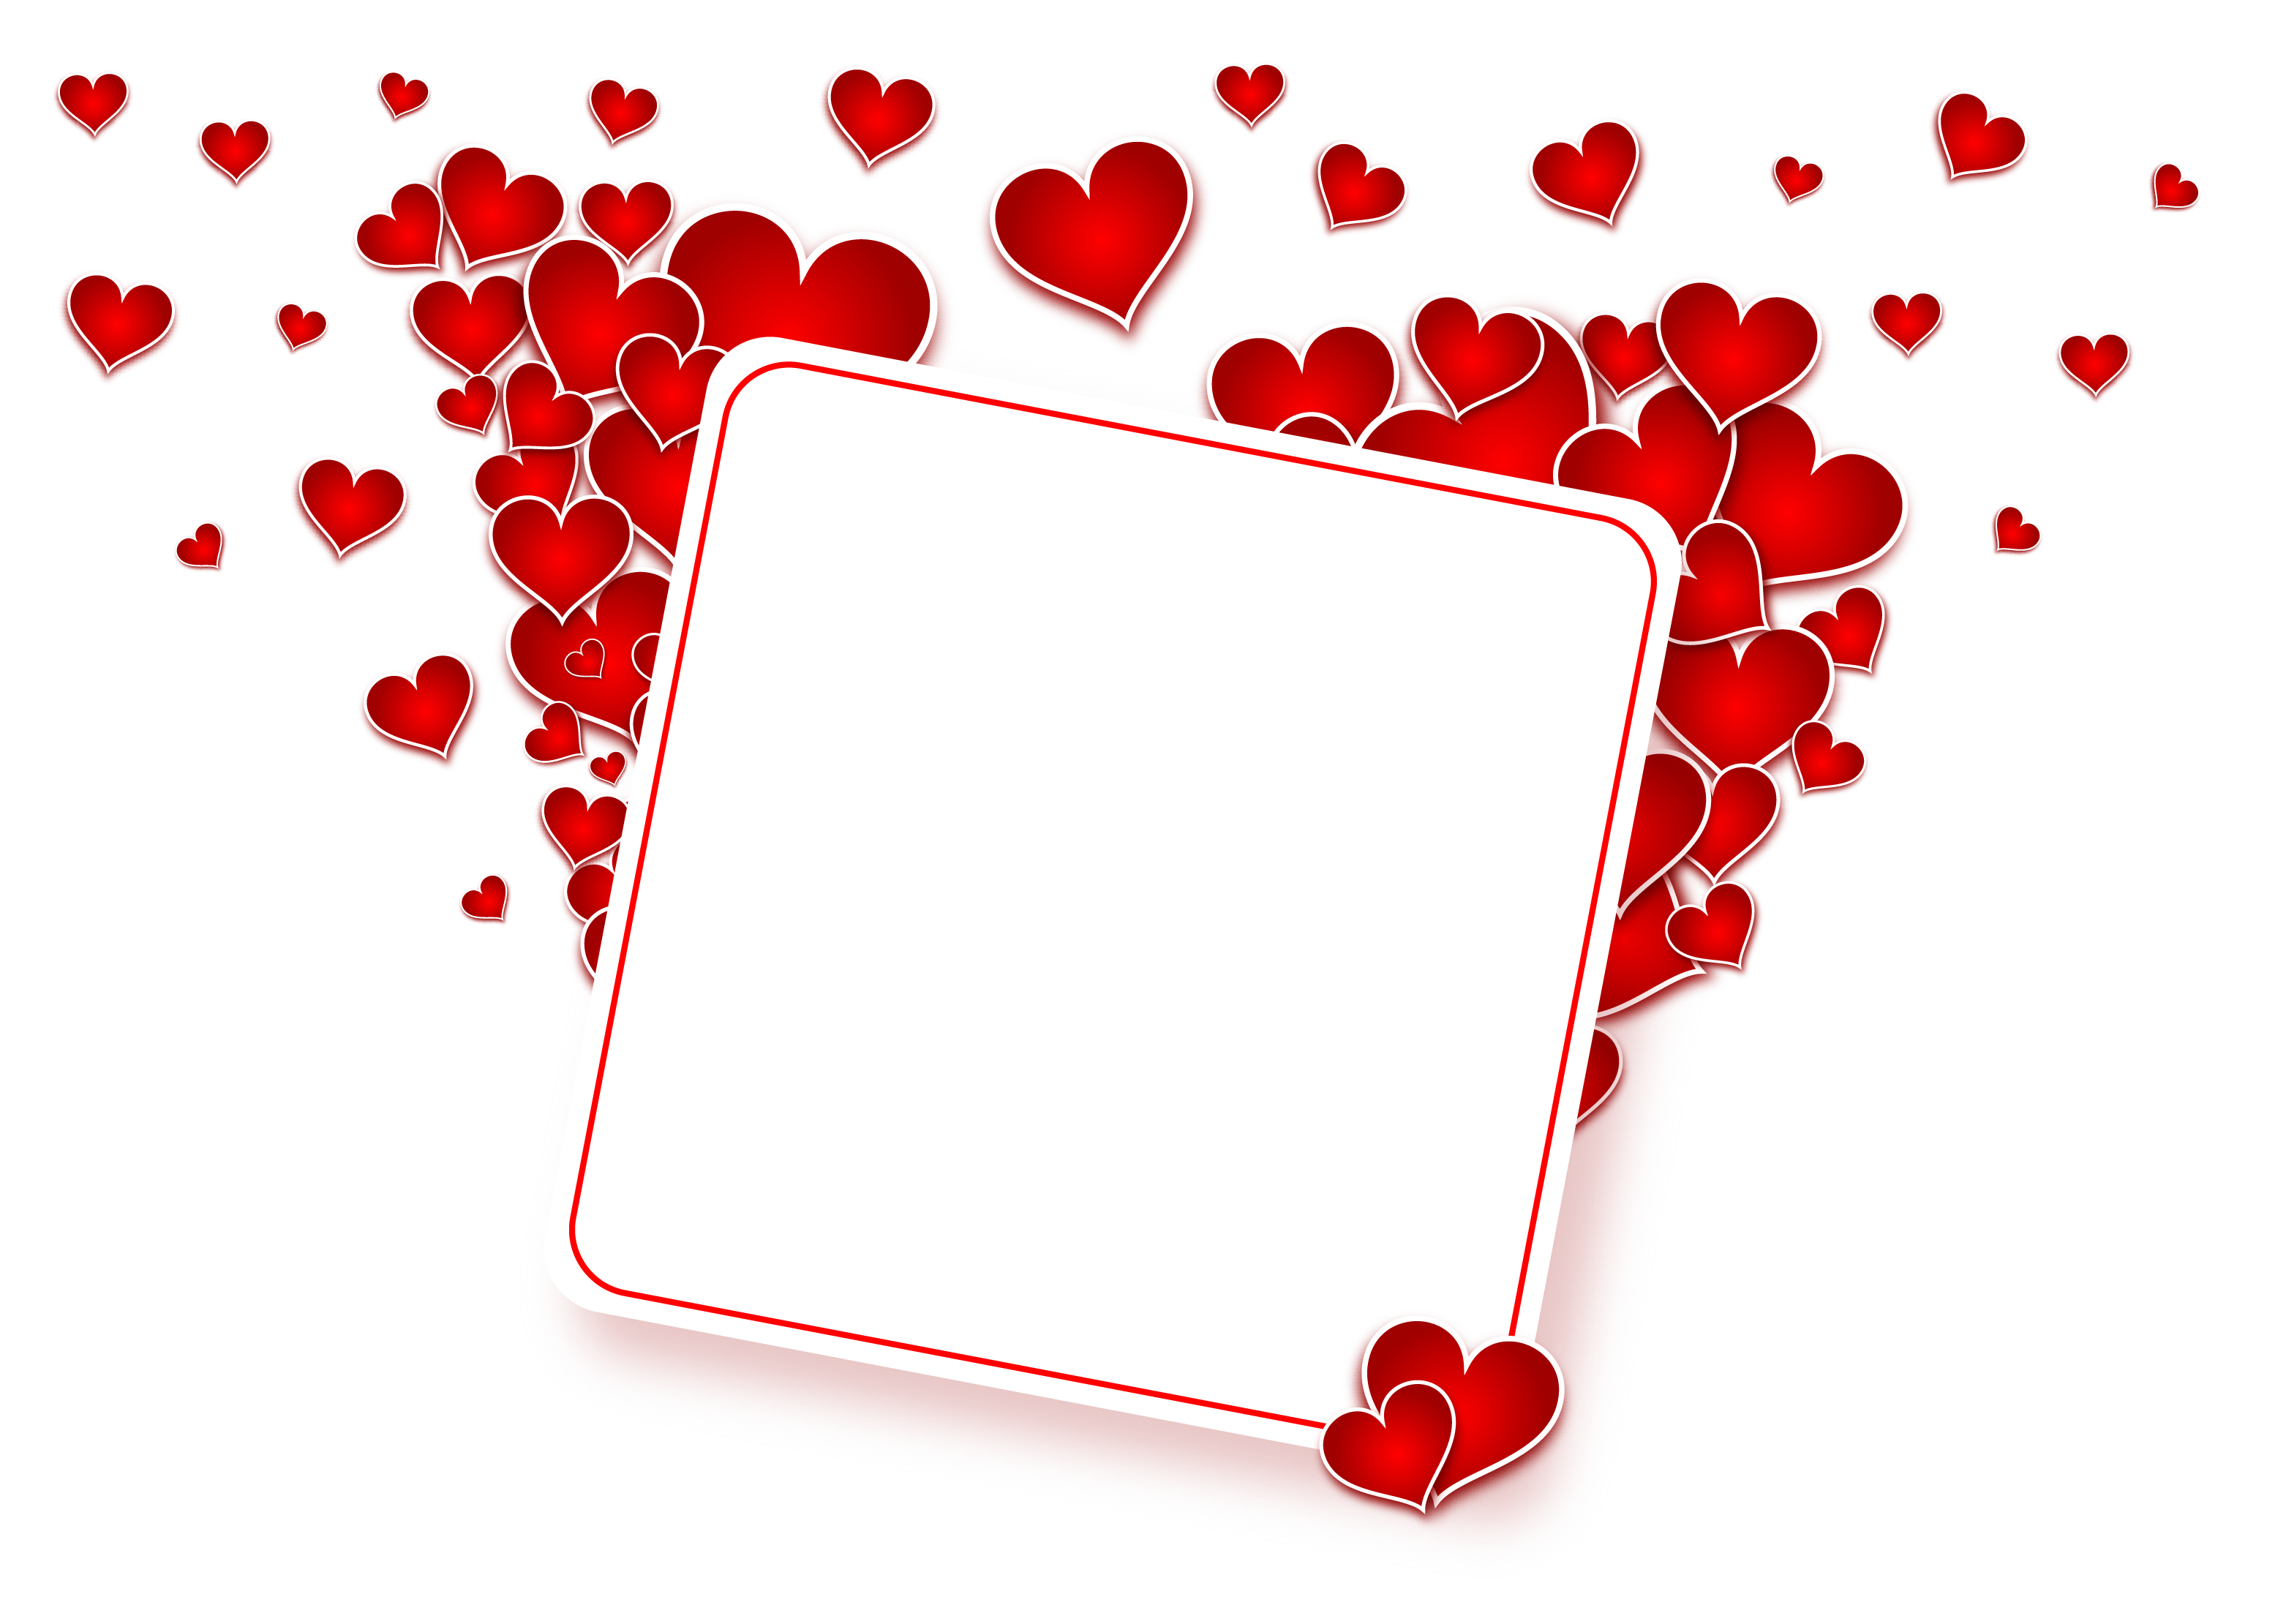 Love Heart Frame PNG Image.